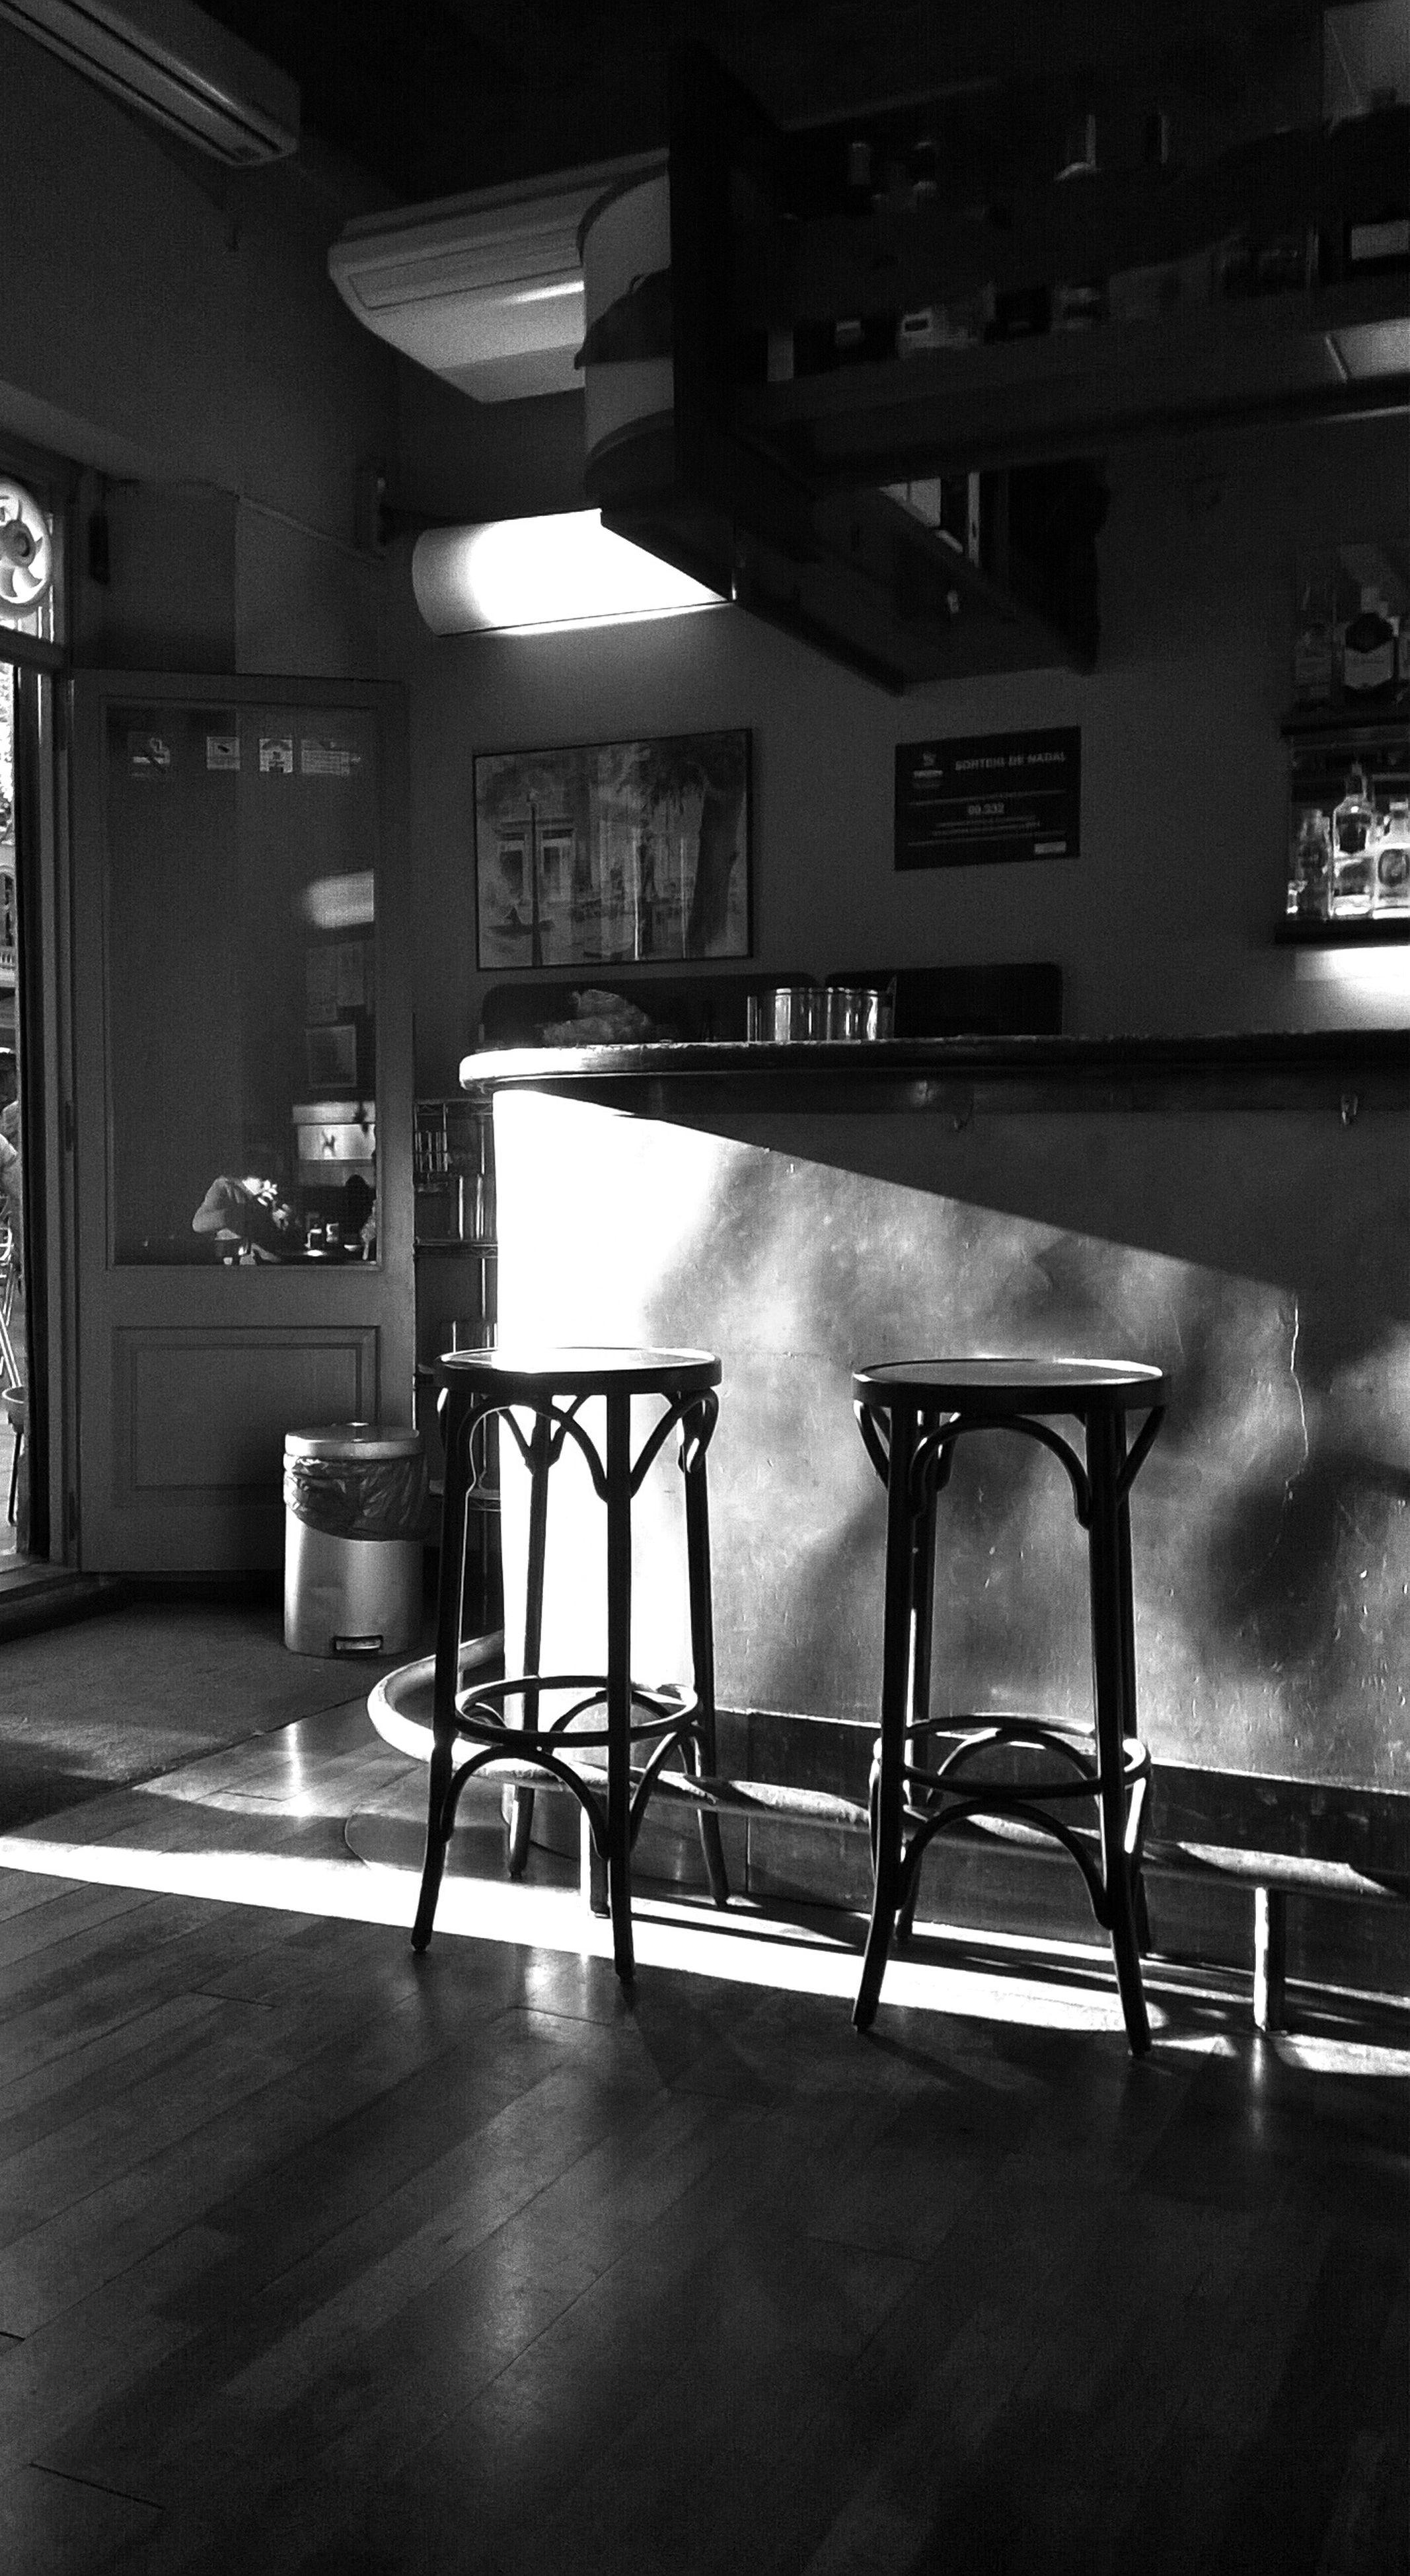 indoors, chair, empty, absence, seat, table, architecture, built structure, illuminated, flooring, restaurant, furniture, interior, window, no people, lighting equipment, tiled floor, sunlight, door, day